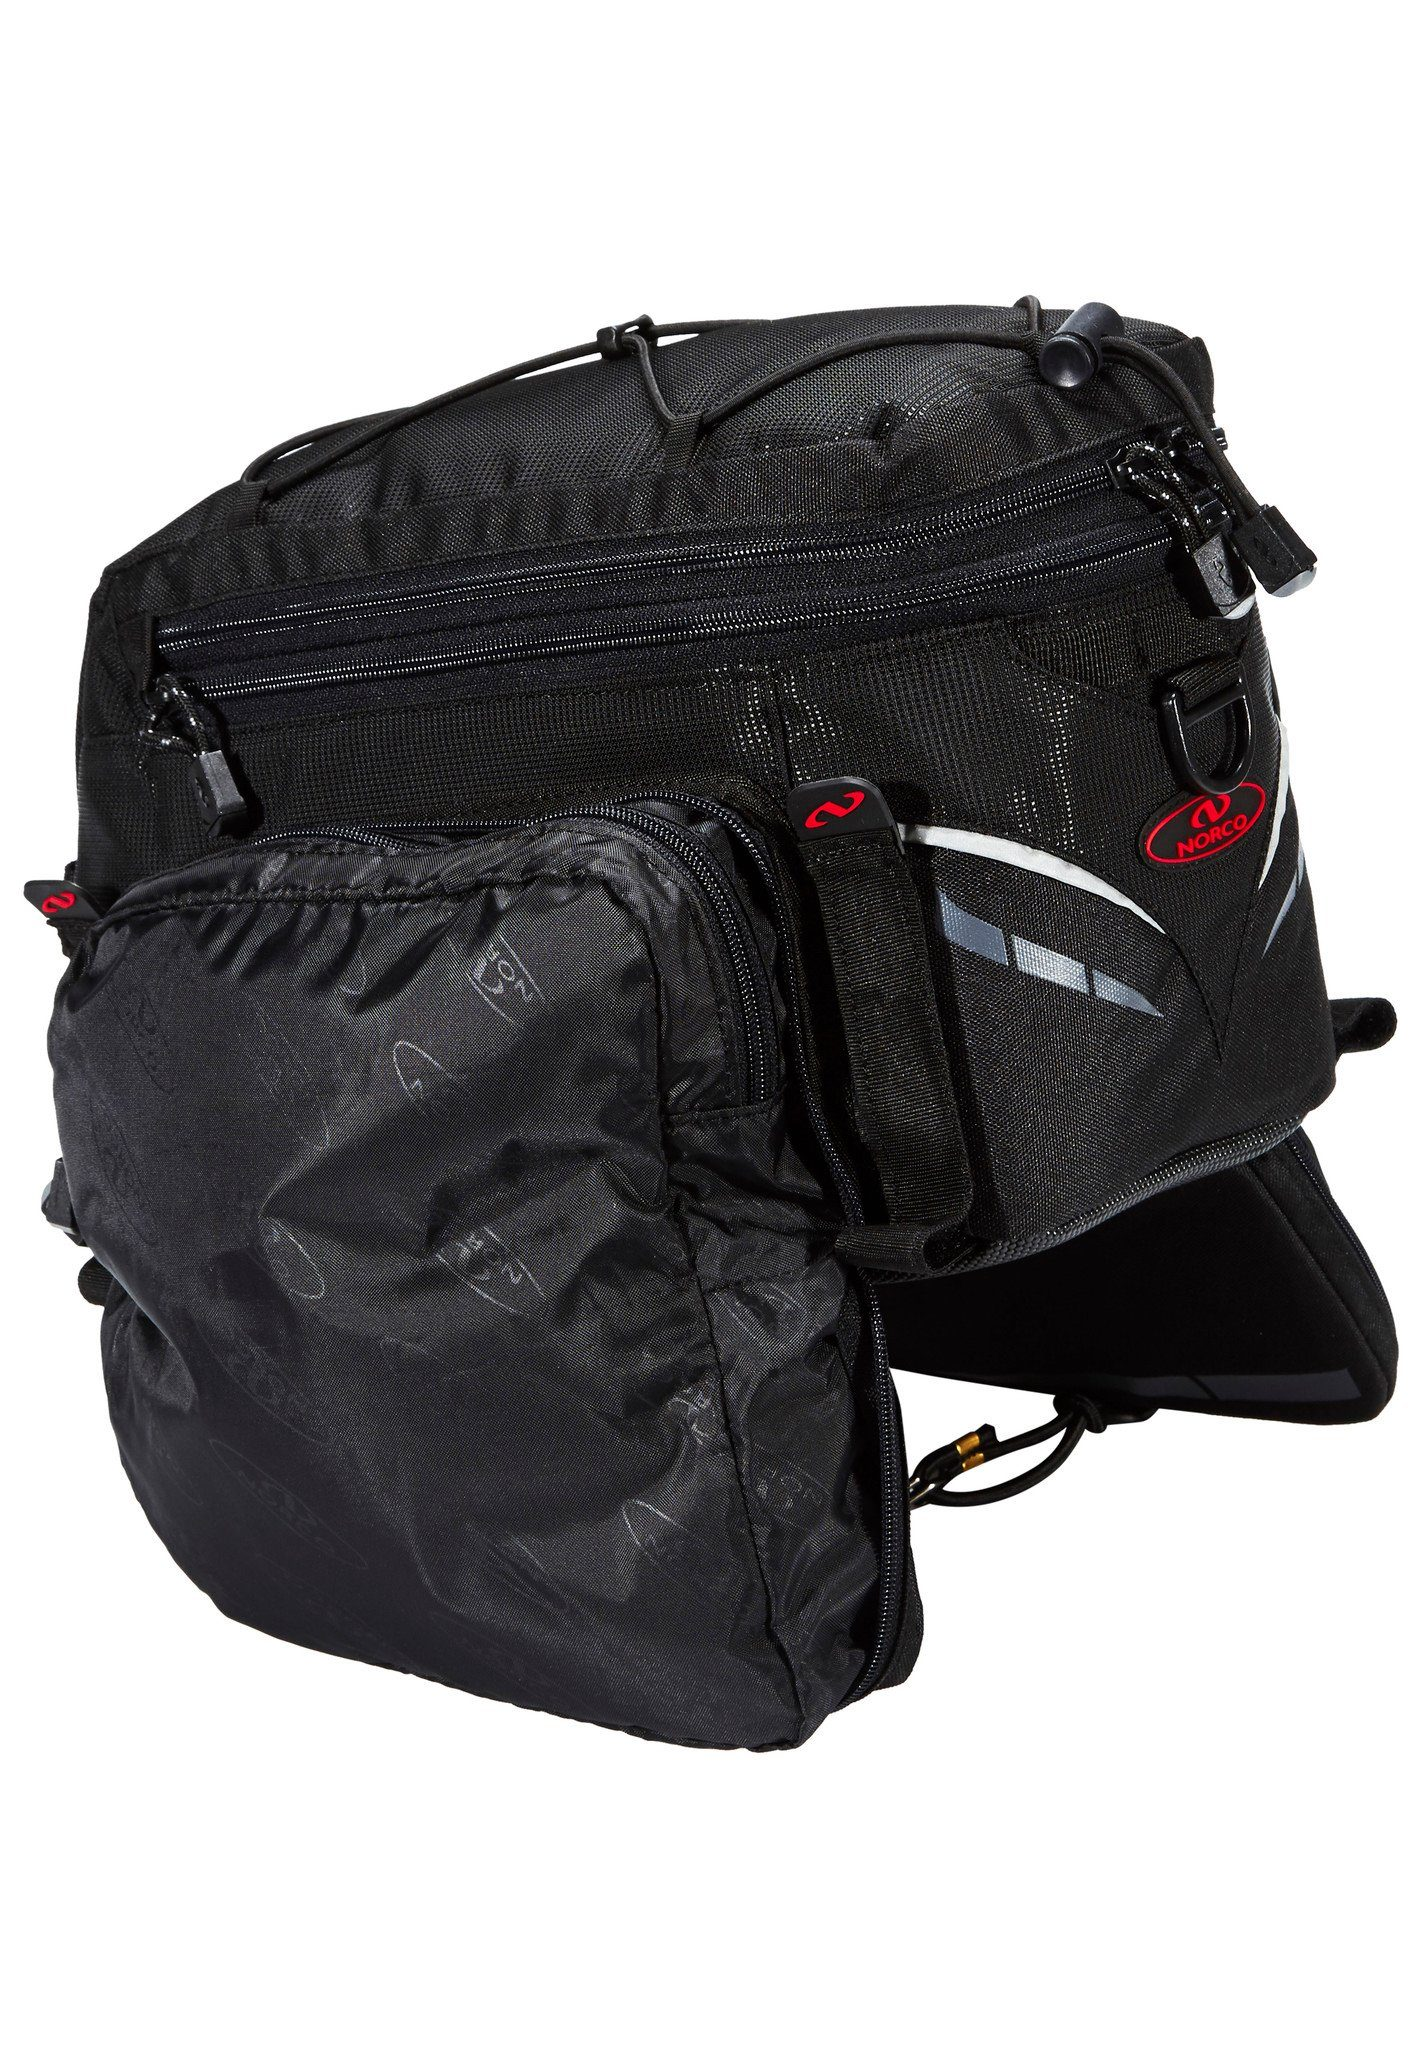 Norco Gepäckträgertasche »Canmore Gepäckträgertasche schwarz«